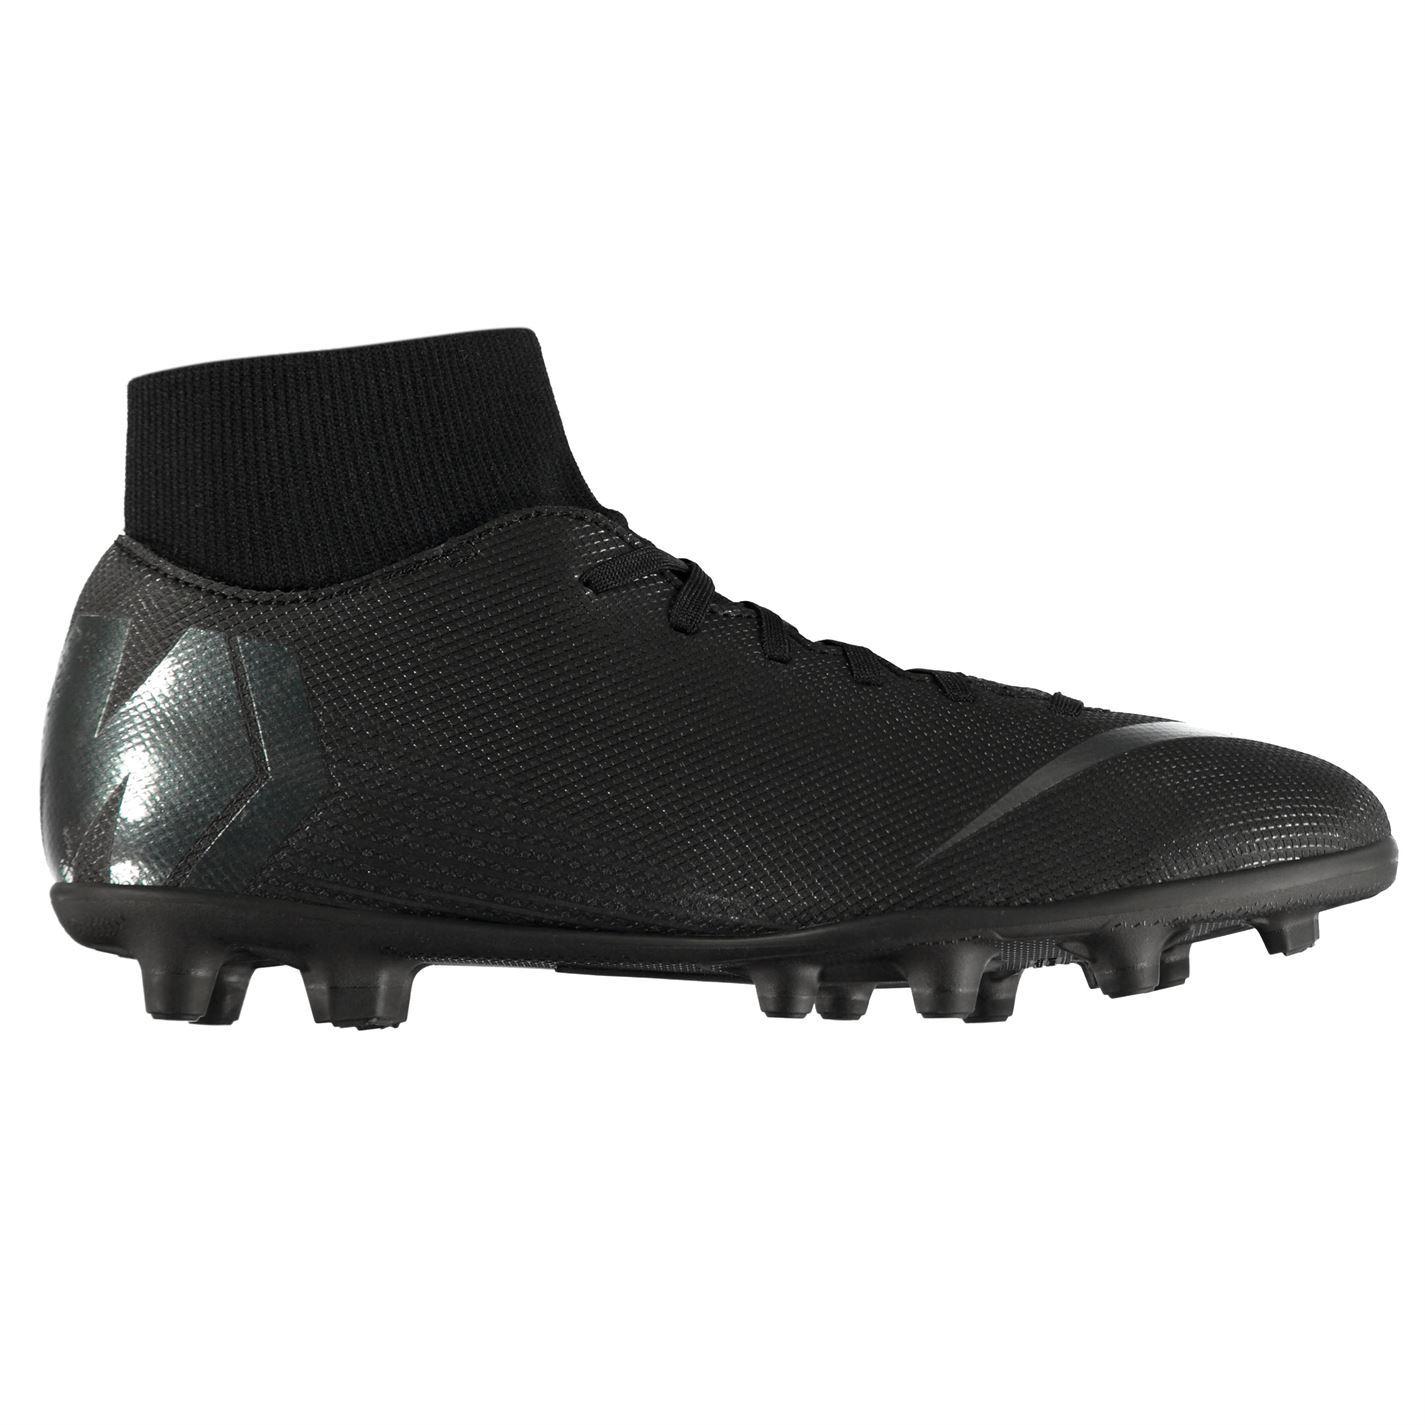 21502989804 Nike Mercurial Superfly Club DF FG Firm Ground Football Boots Mens ...